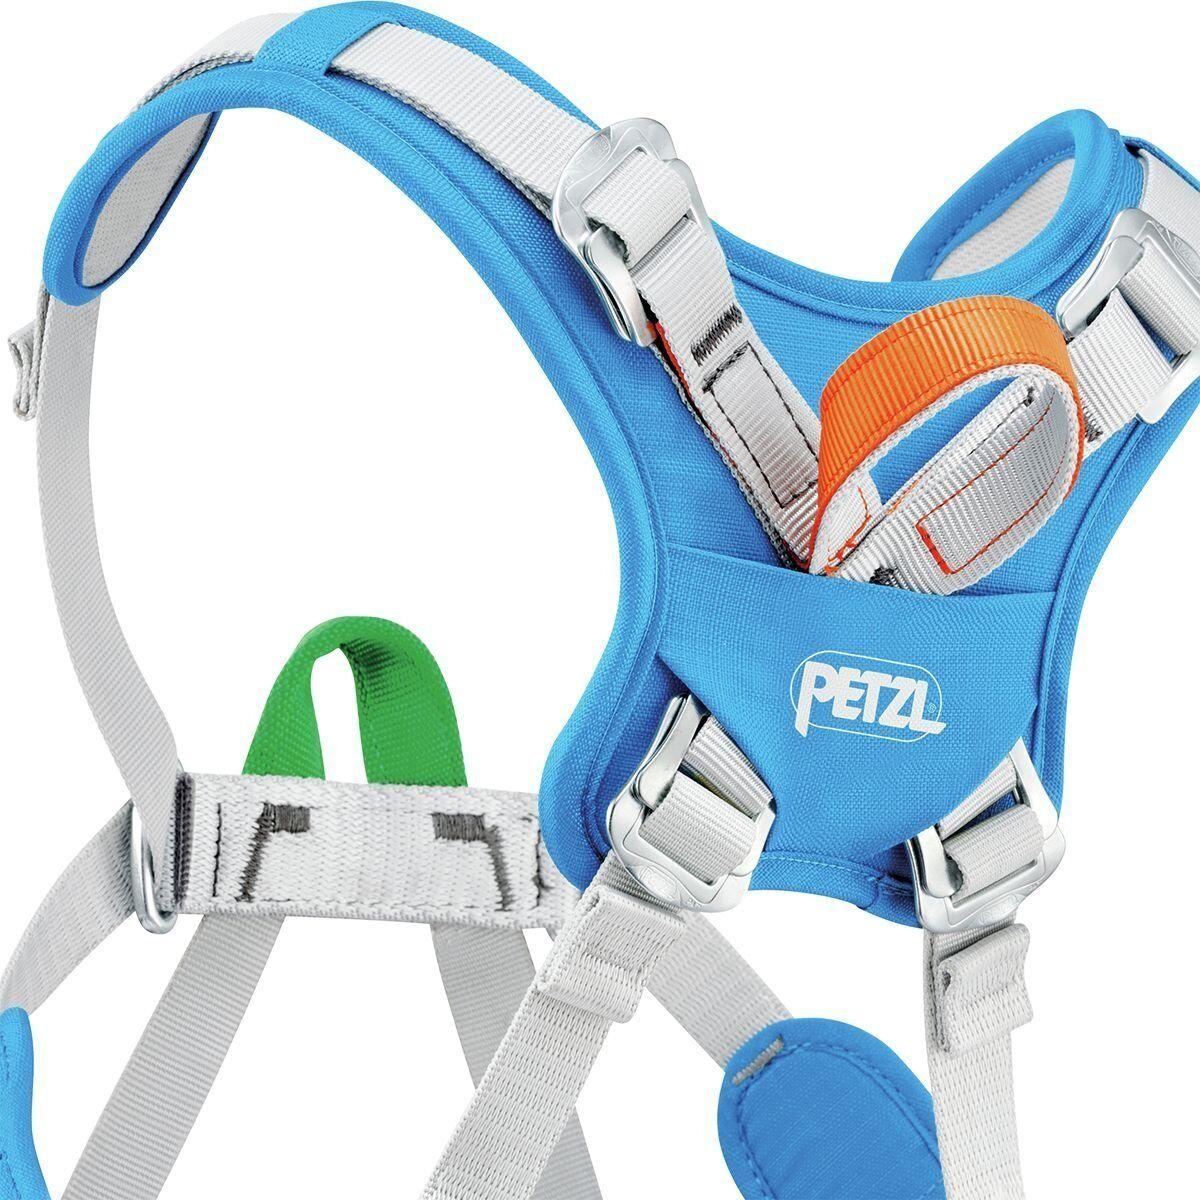 Petzl moins enfants ouistiti Harnais d'escalade, bleu de méthyle, moins Petzl 30 kgs *NEUF* 69f2a9